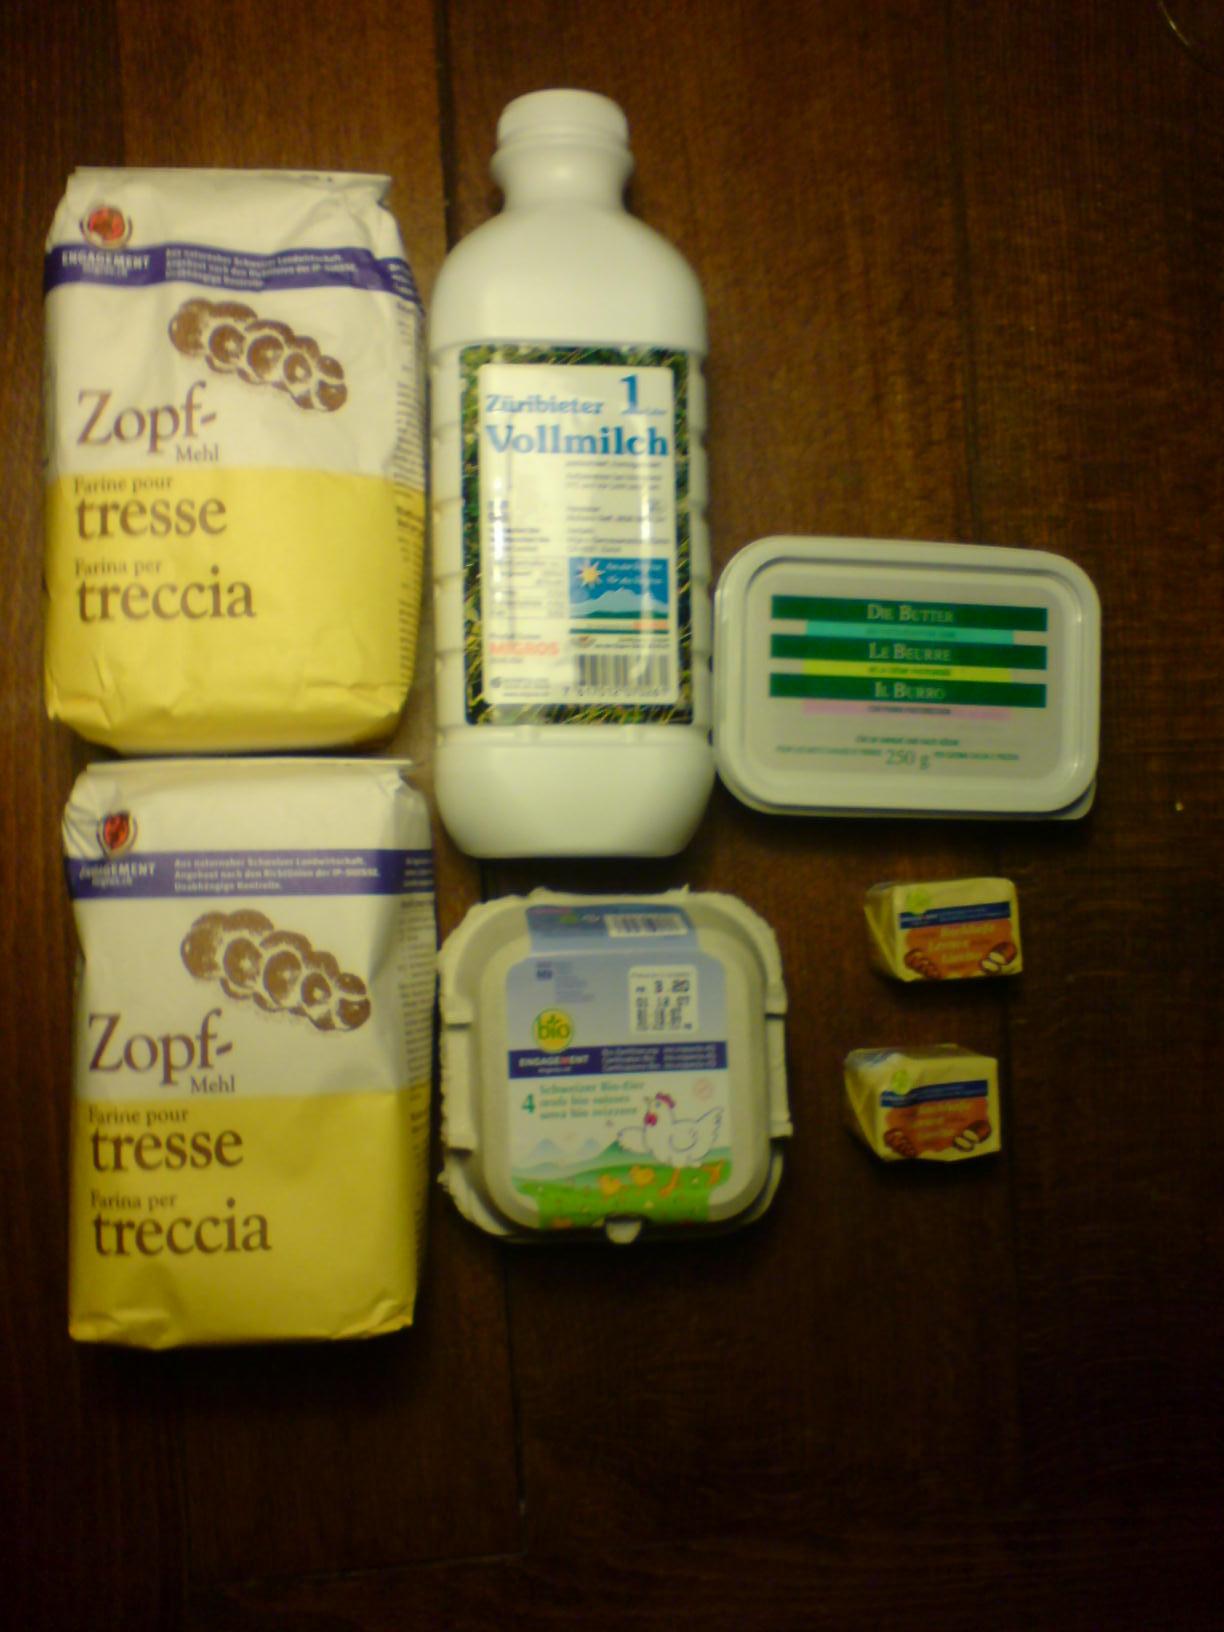 Zopf Step 1